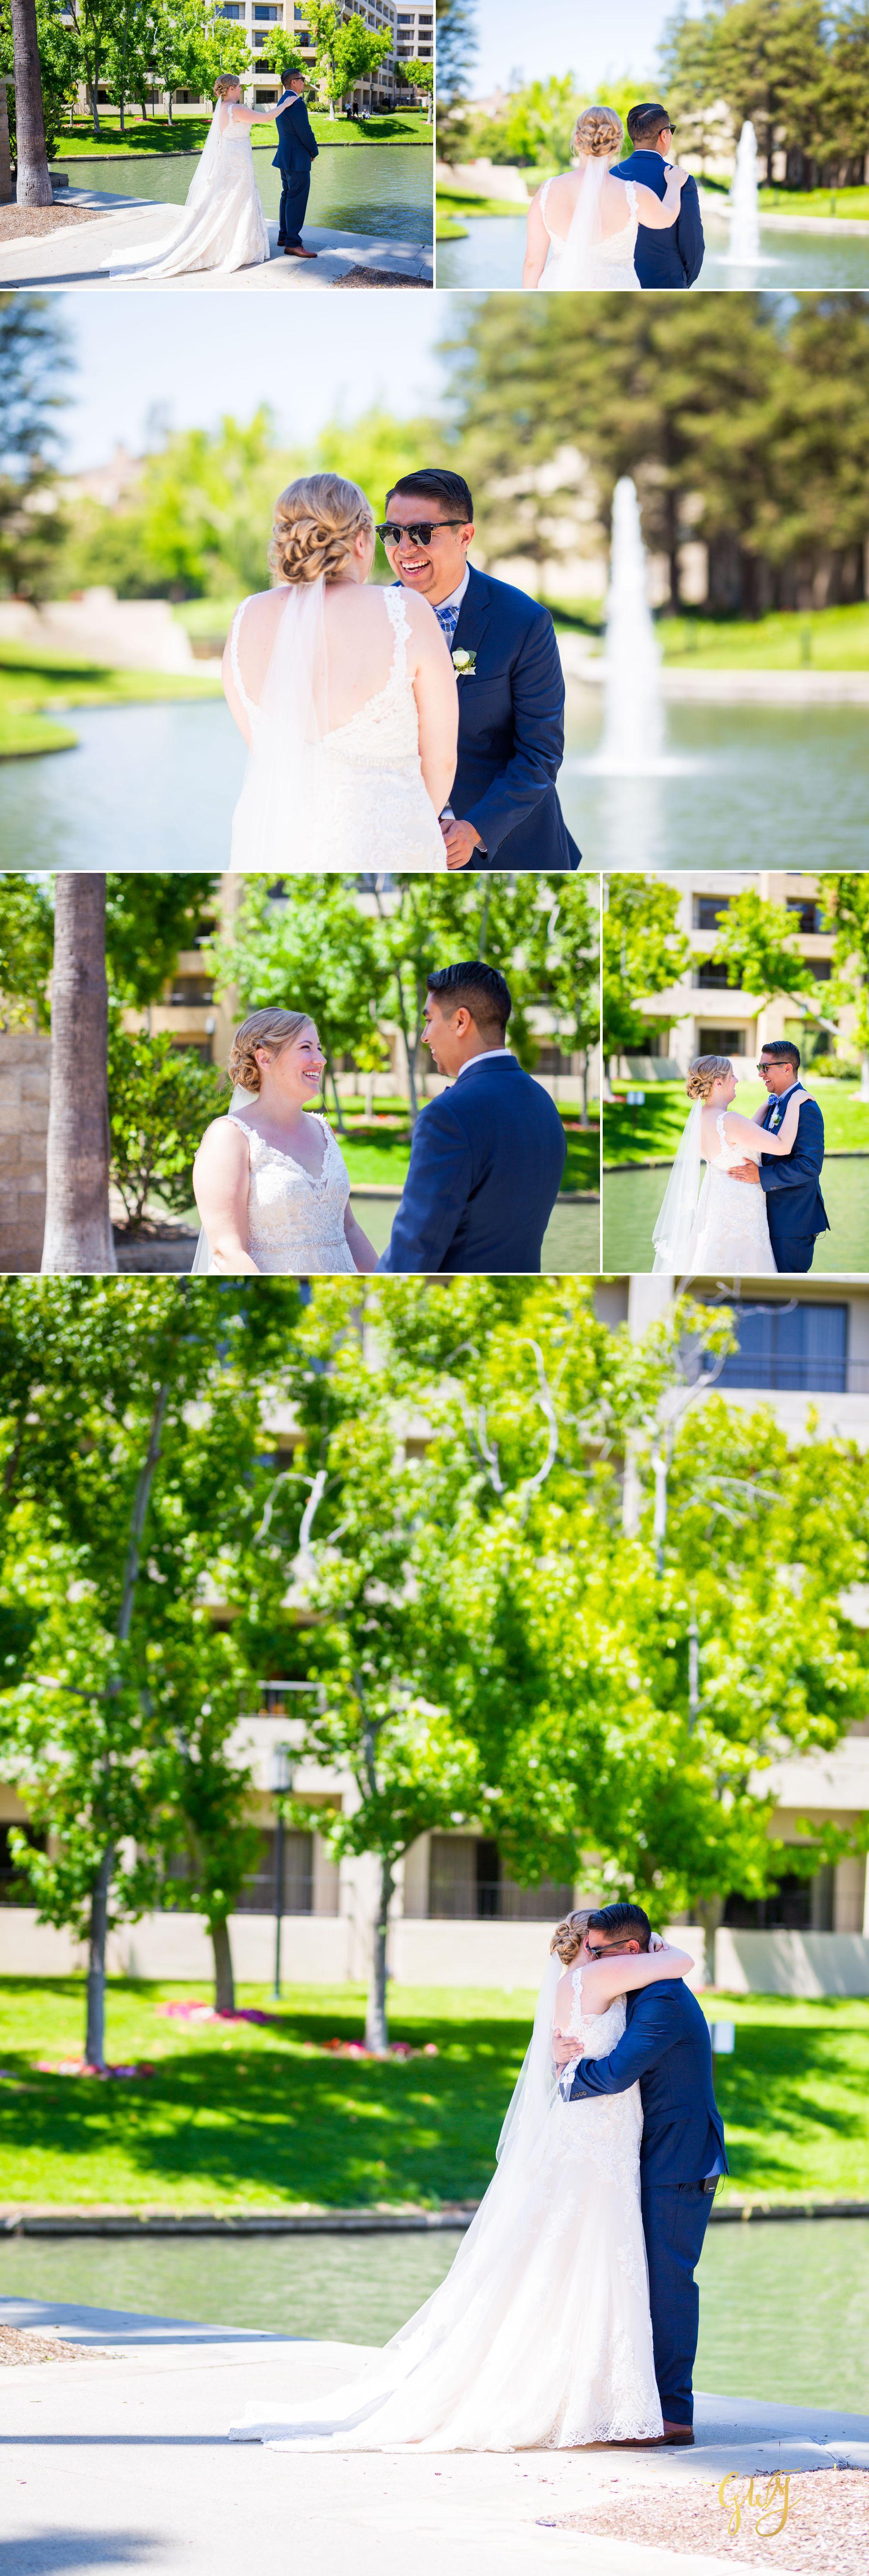 Javier + Kari Avenue of the Arts First Look Vintage Rose Wedding Ceremony Reception by Glass Woods Media 6.jpg